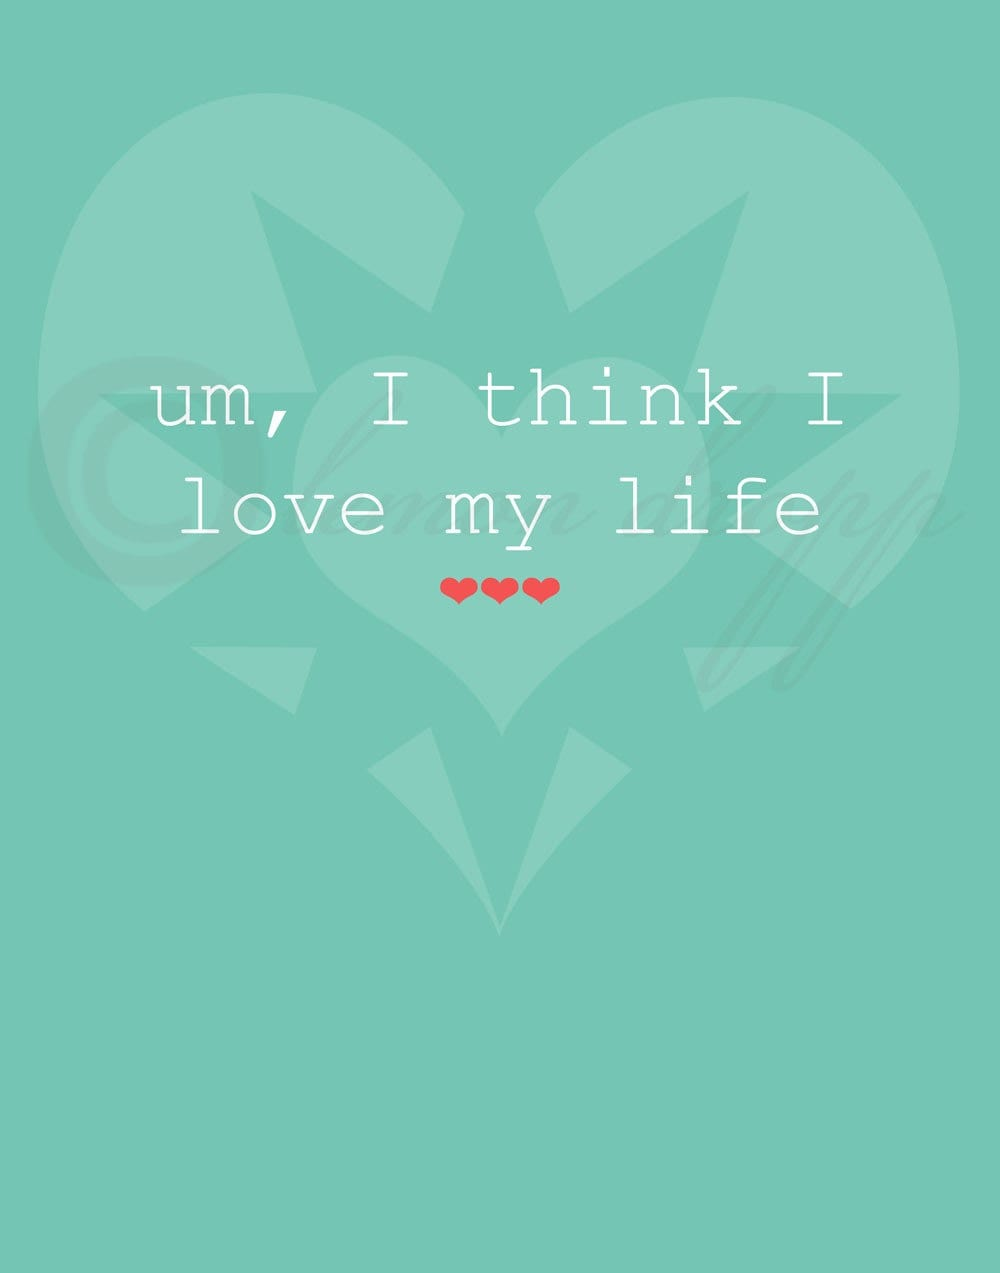 I Love My Life - 8x10 print